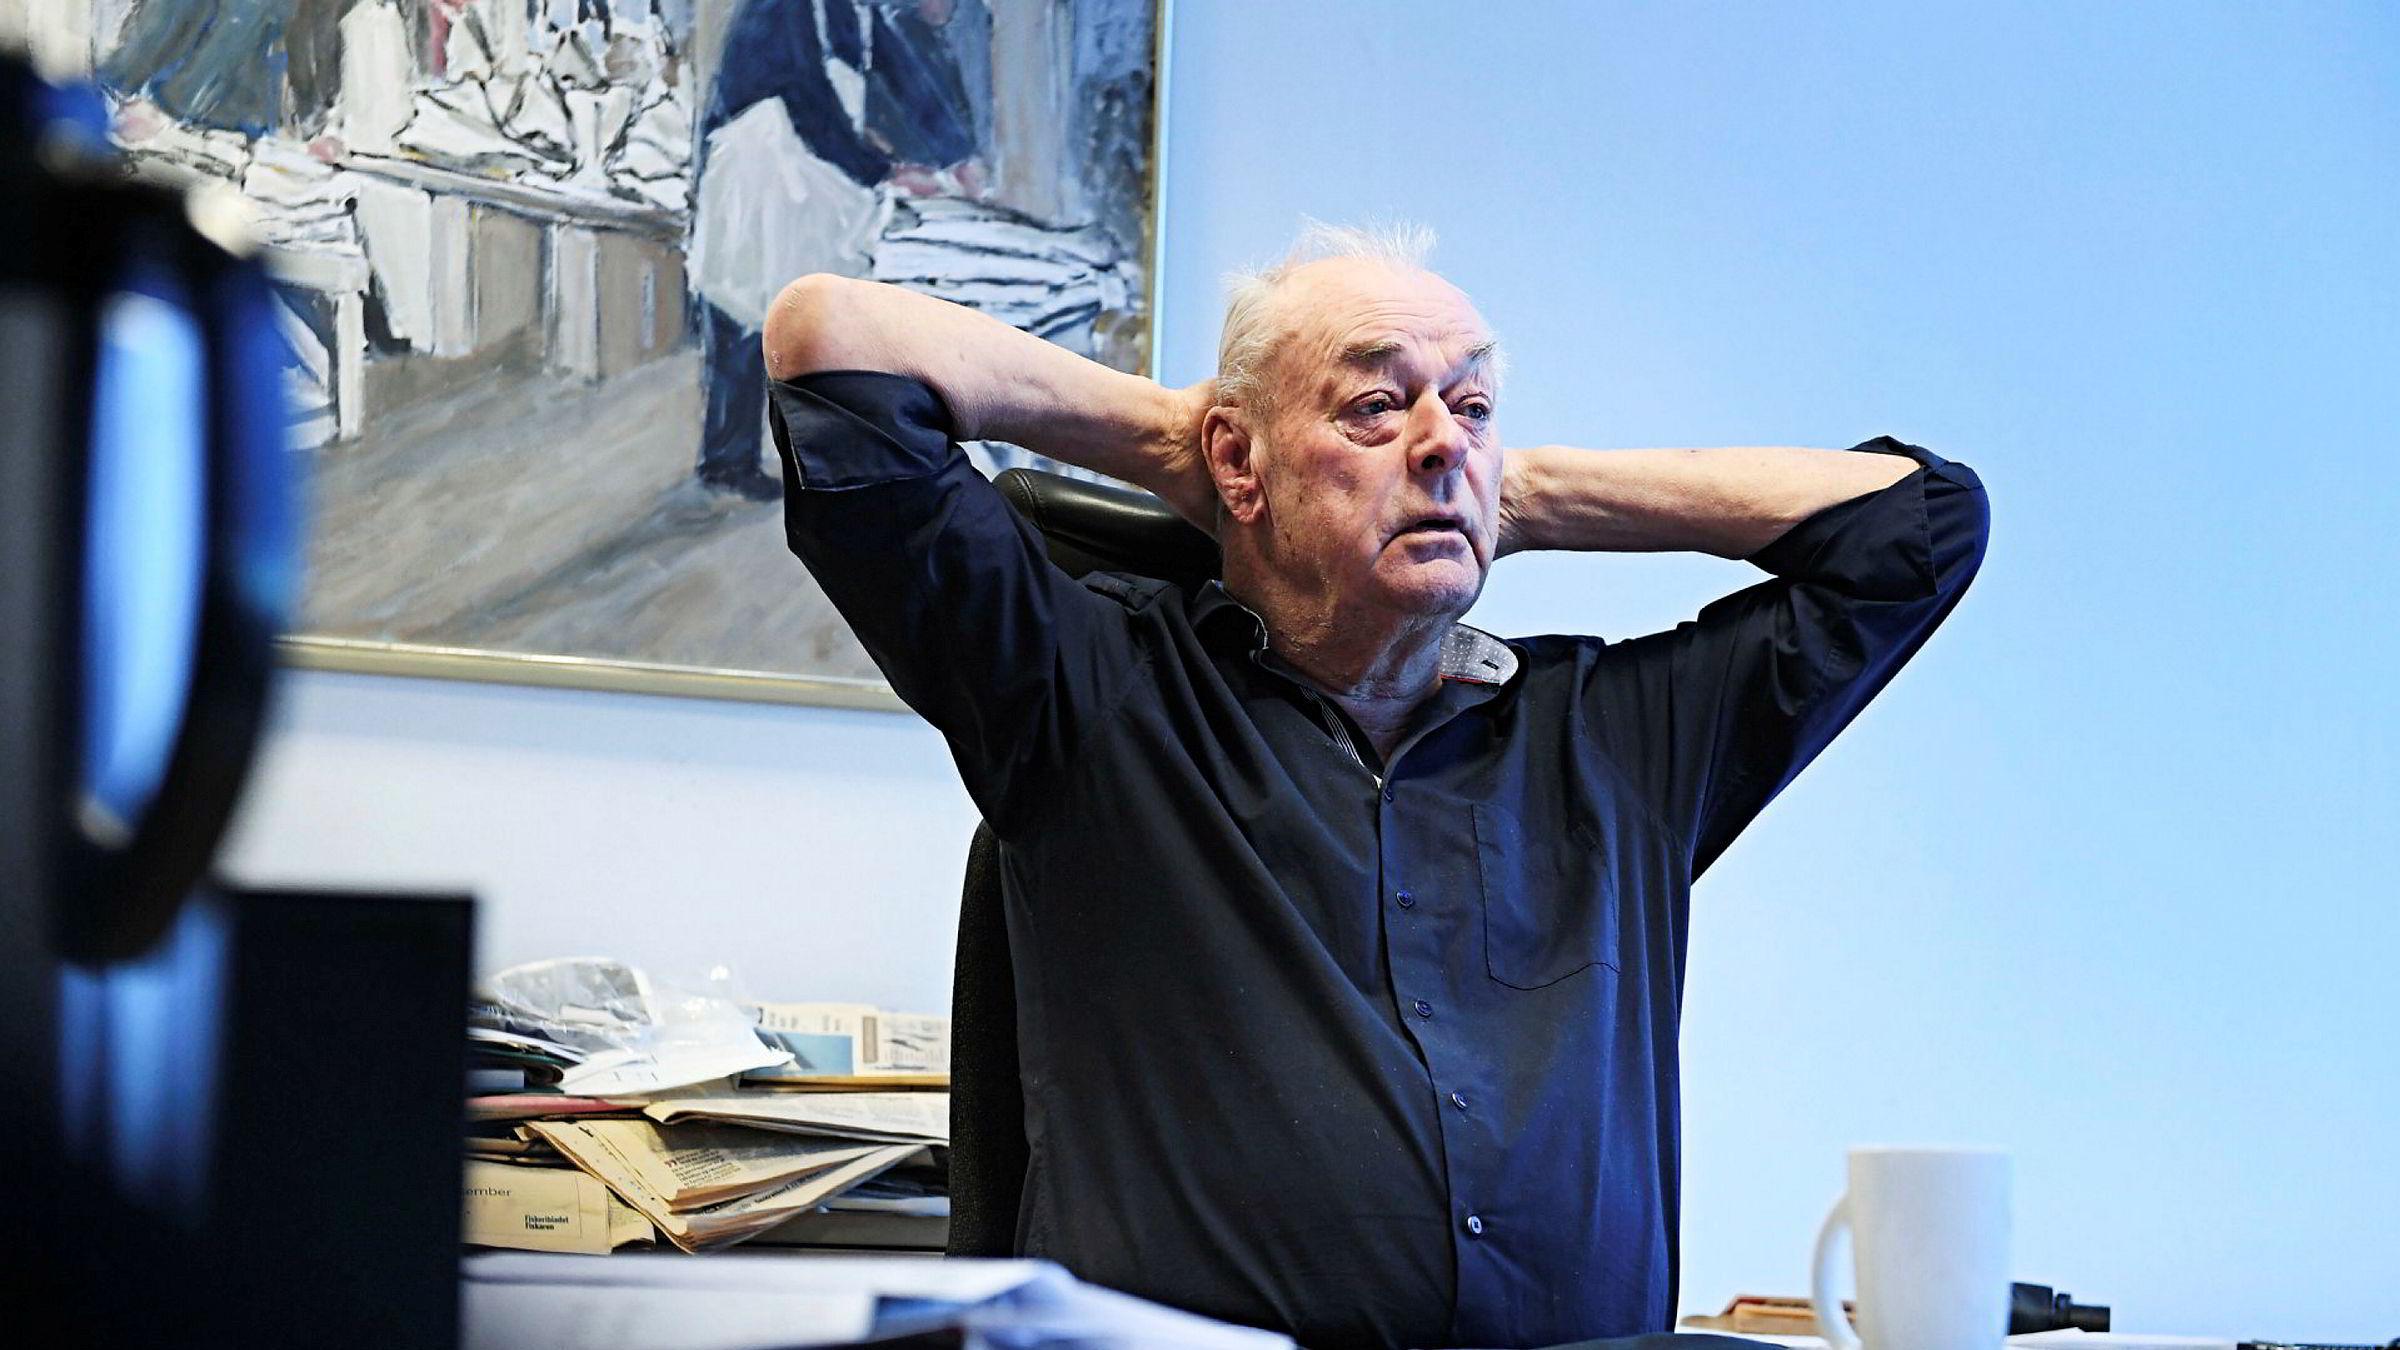 Anders Pedersen solgte Fjordlaks Aqua i fjor for en milliard. Det er han glad for, for han mener gullalderen i næringen er definitivt over.